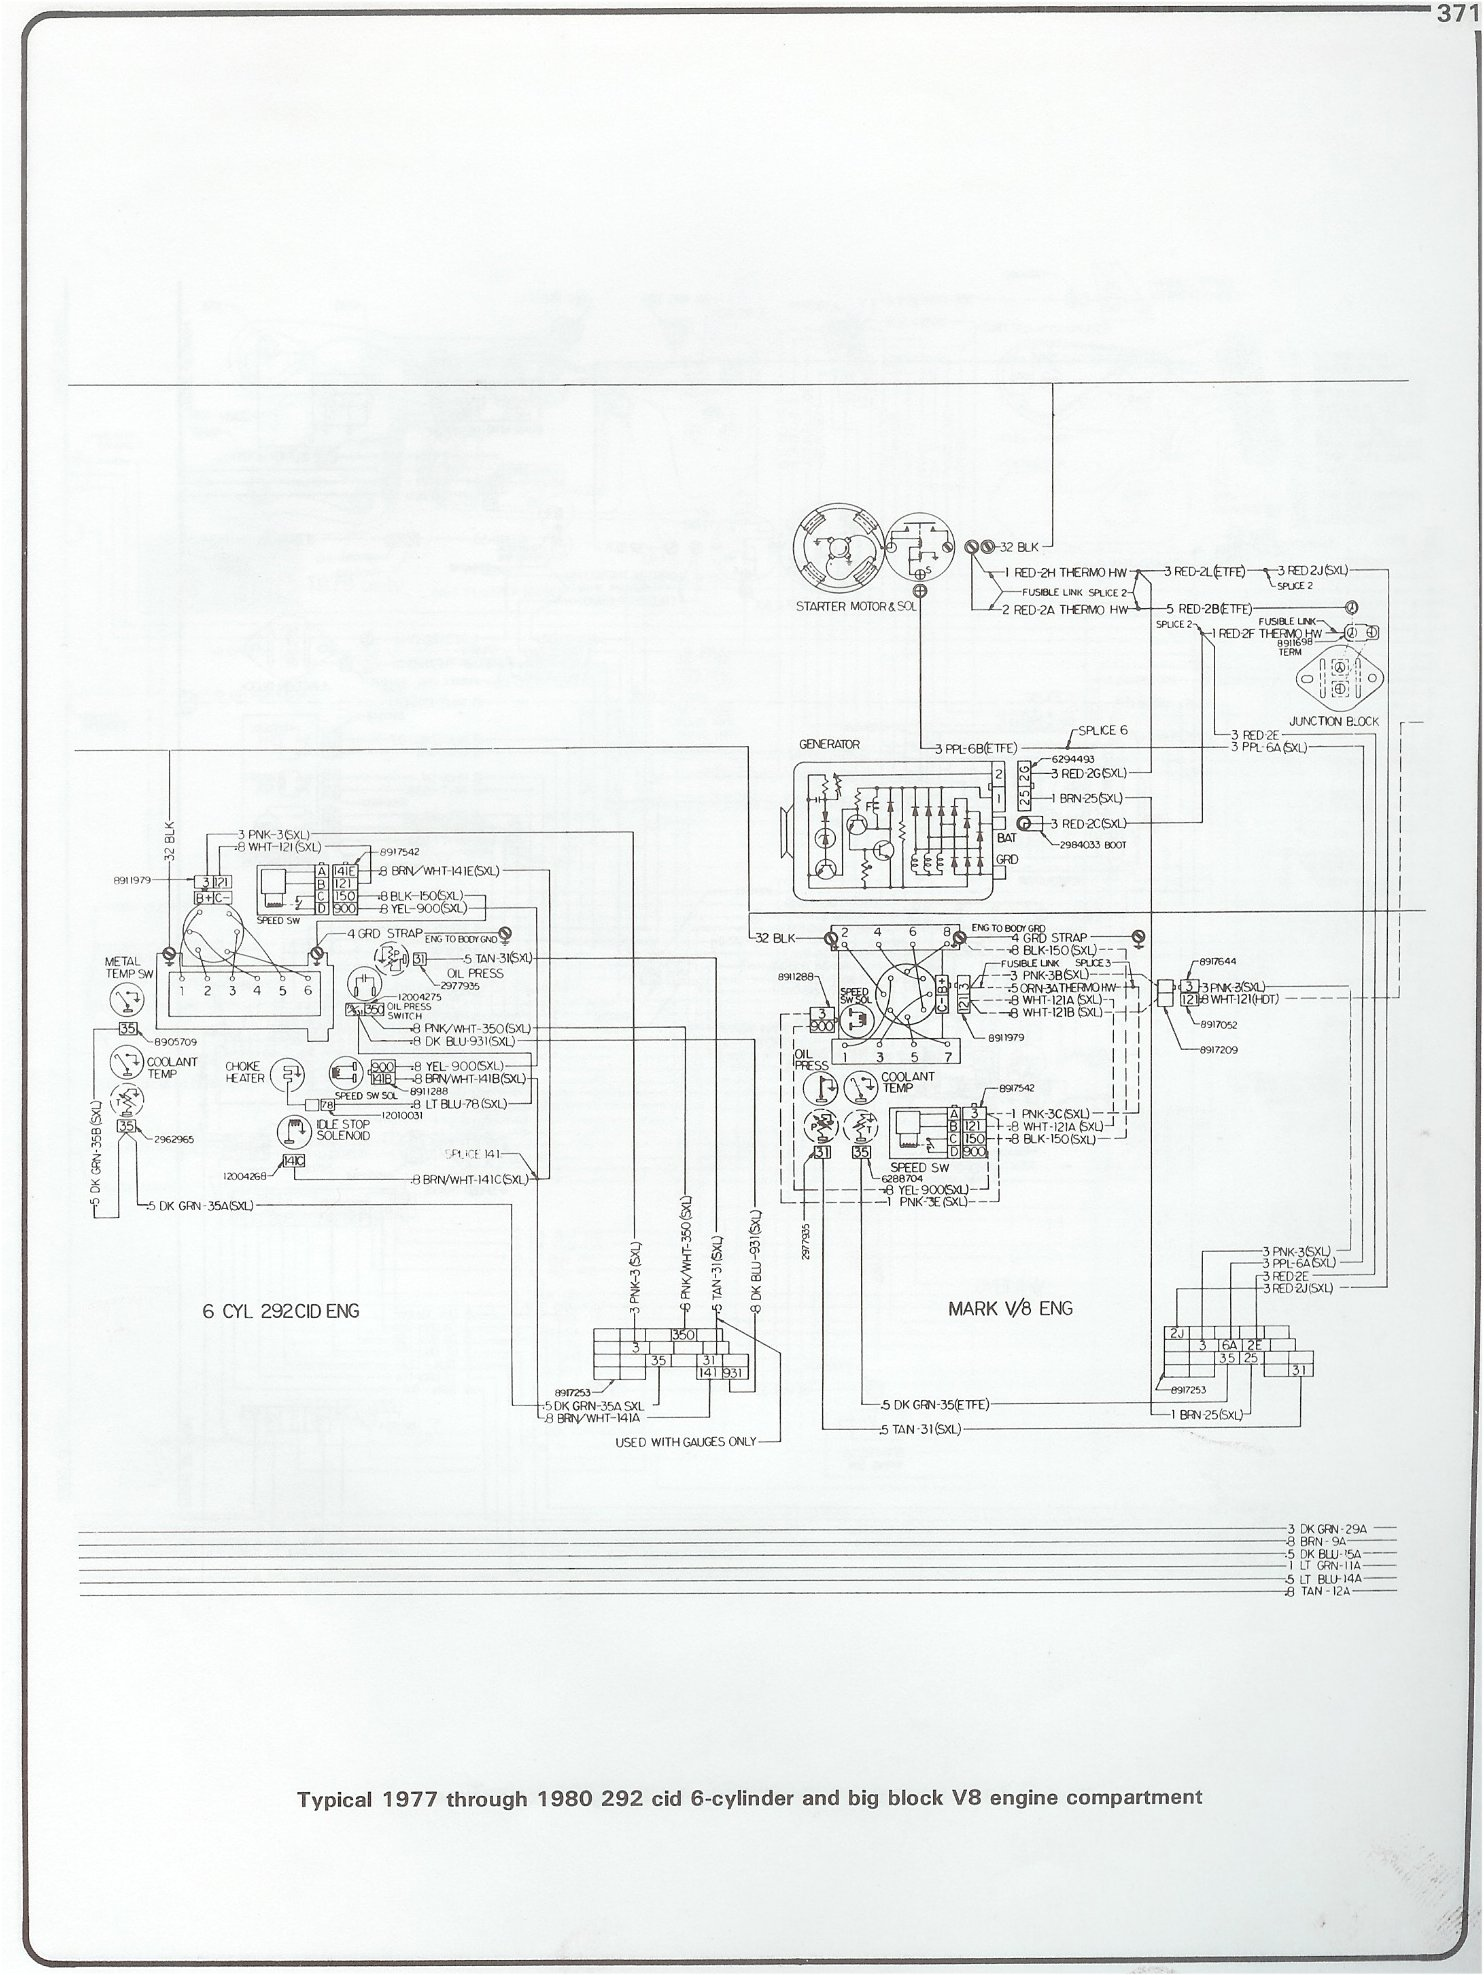 1978 chevy silverado wiring diagram onstar for chevrolet under hood schematic cheny blazer